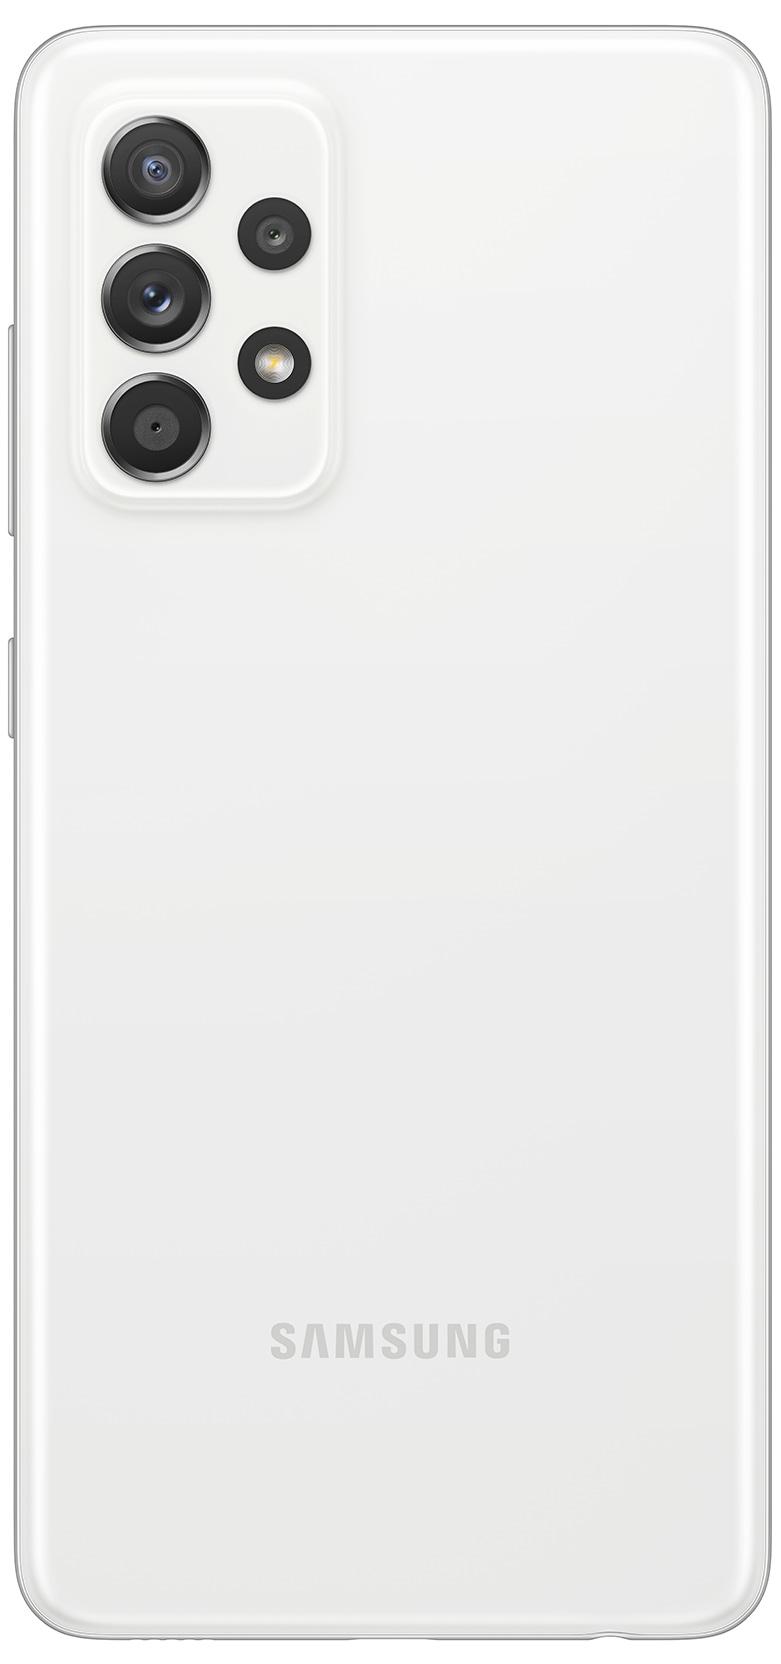 Samsung Galaxy A52 DS (SM-A525) 256GB White - 3